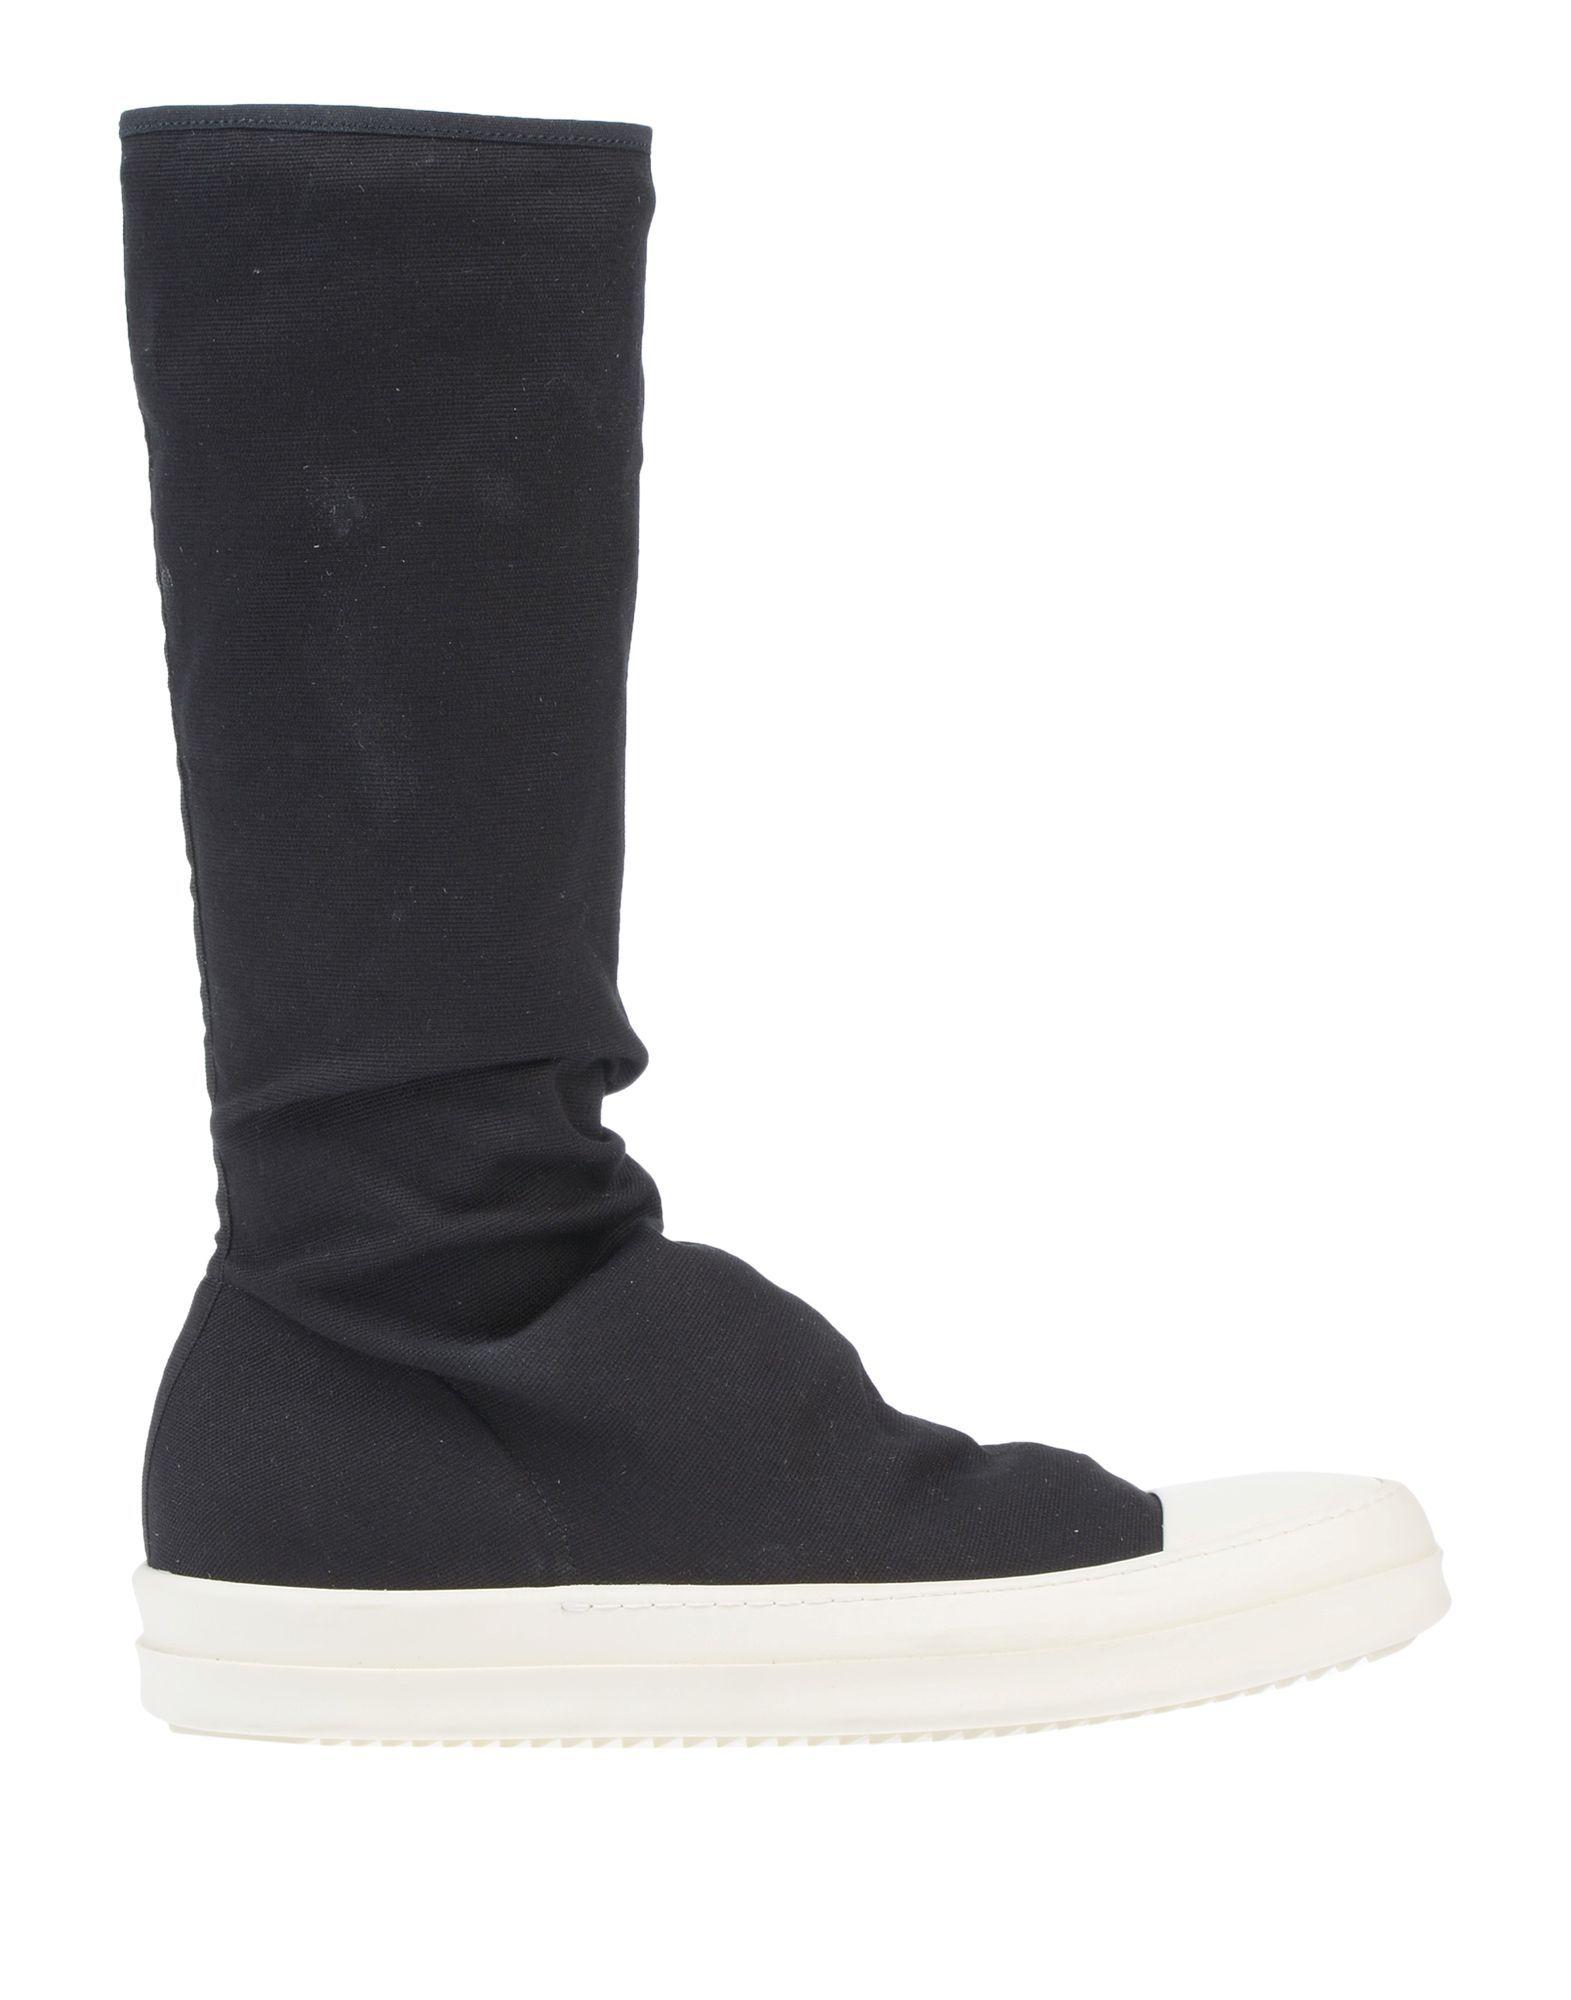 99817f0534a9 RICK OWENS DRKSHDW BOOTS.  rickowensdrkshdw  shoes